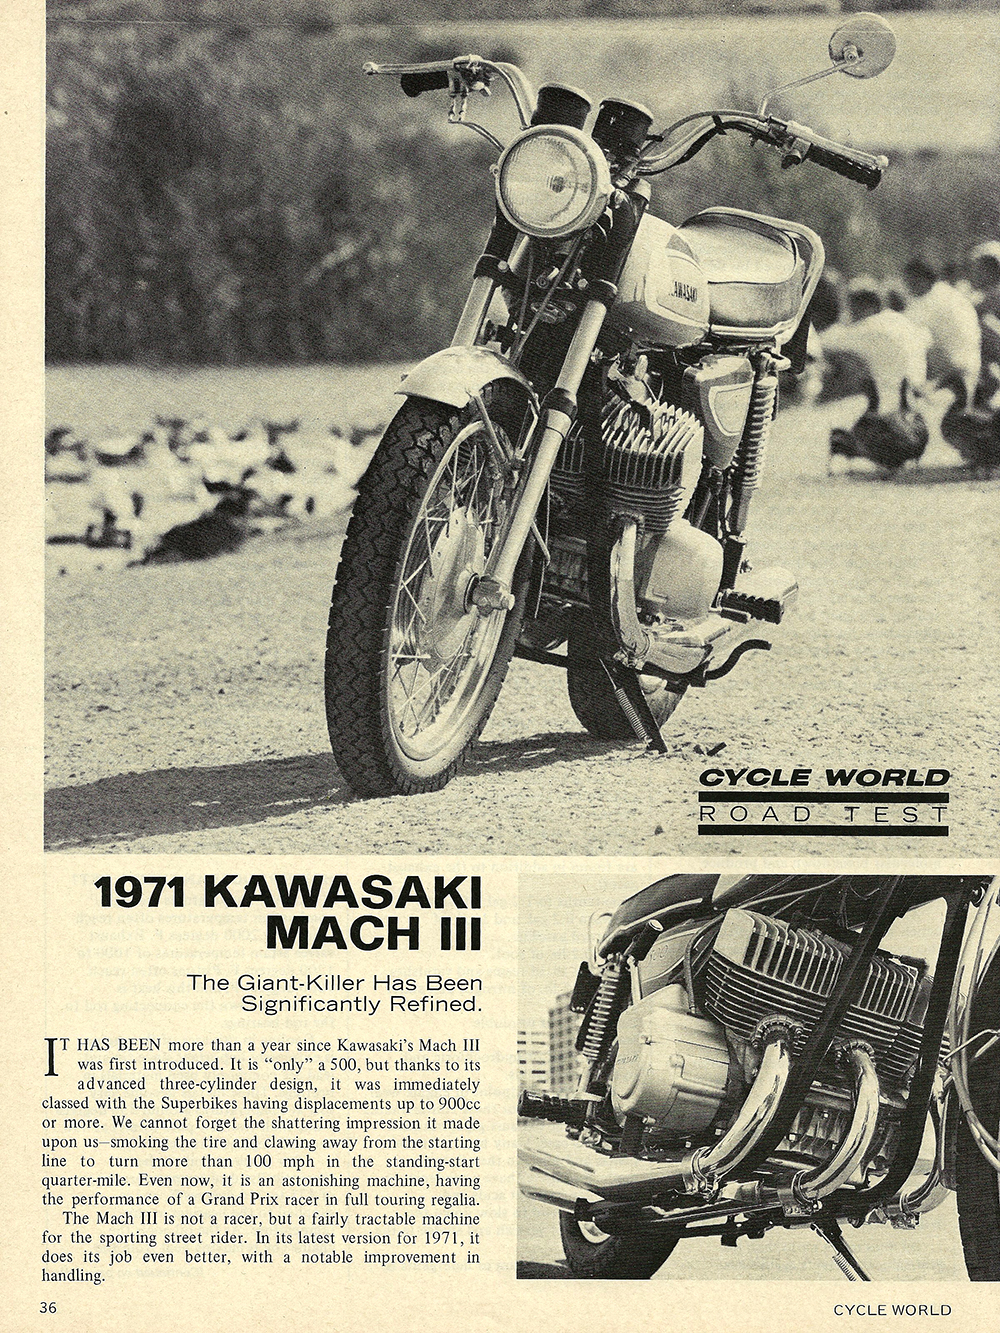 1971 Kawasaki Mach 3 road test 01.jpg